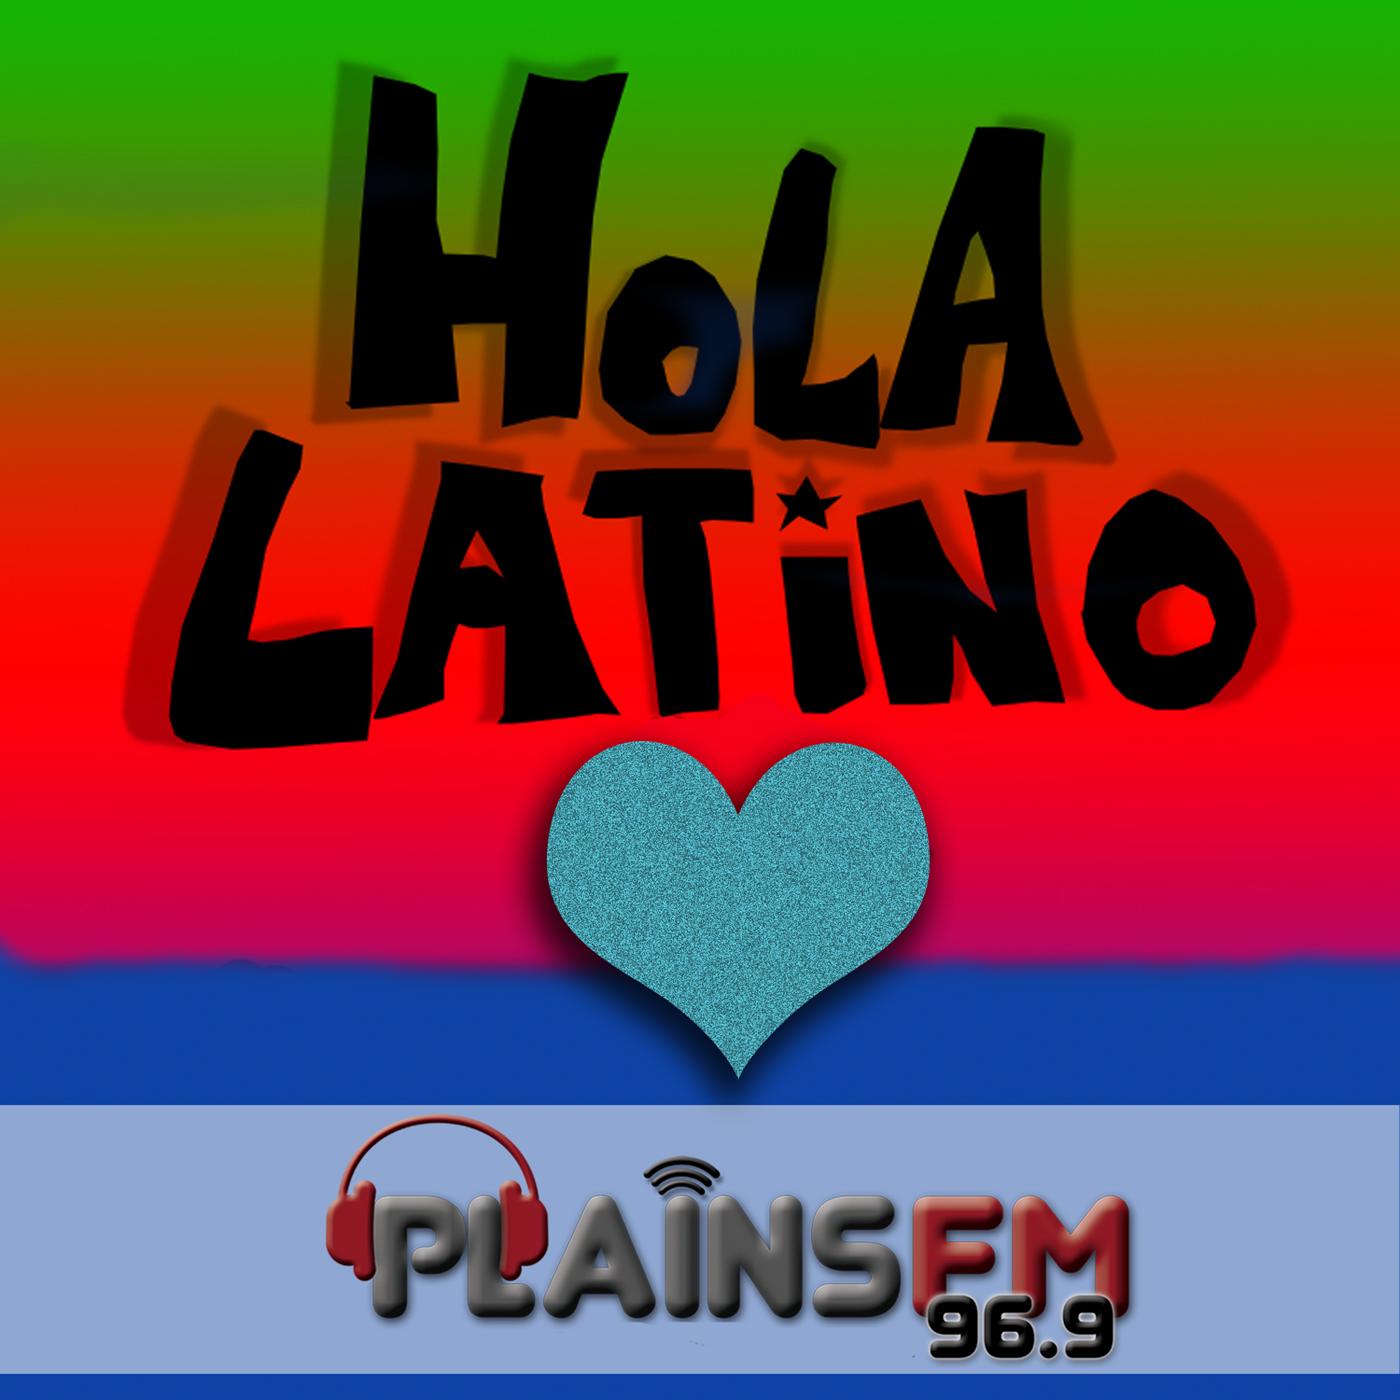 https://cdn.accessradio.org/StationFolder/plainsfm/Images/Hola Latino heart.png